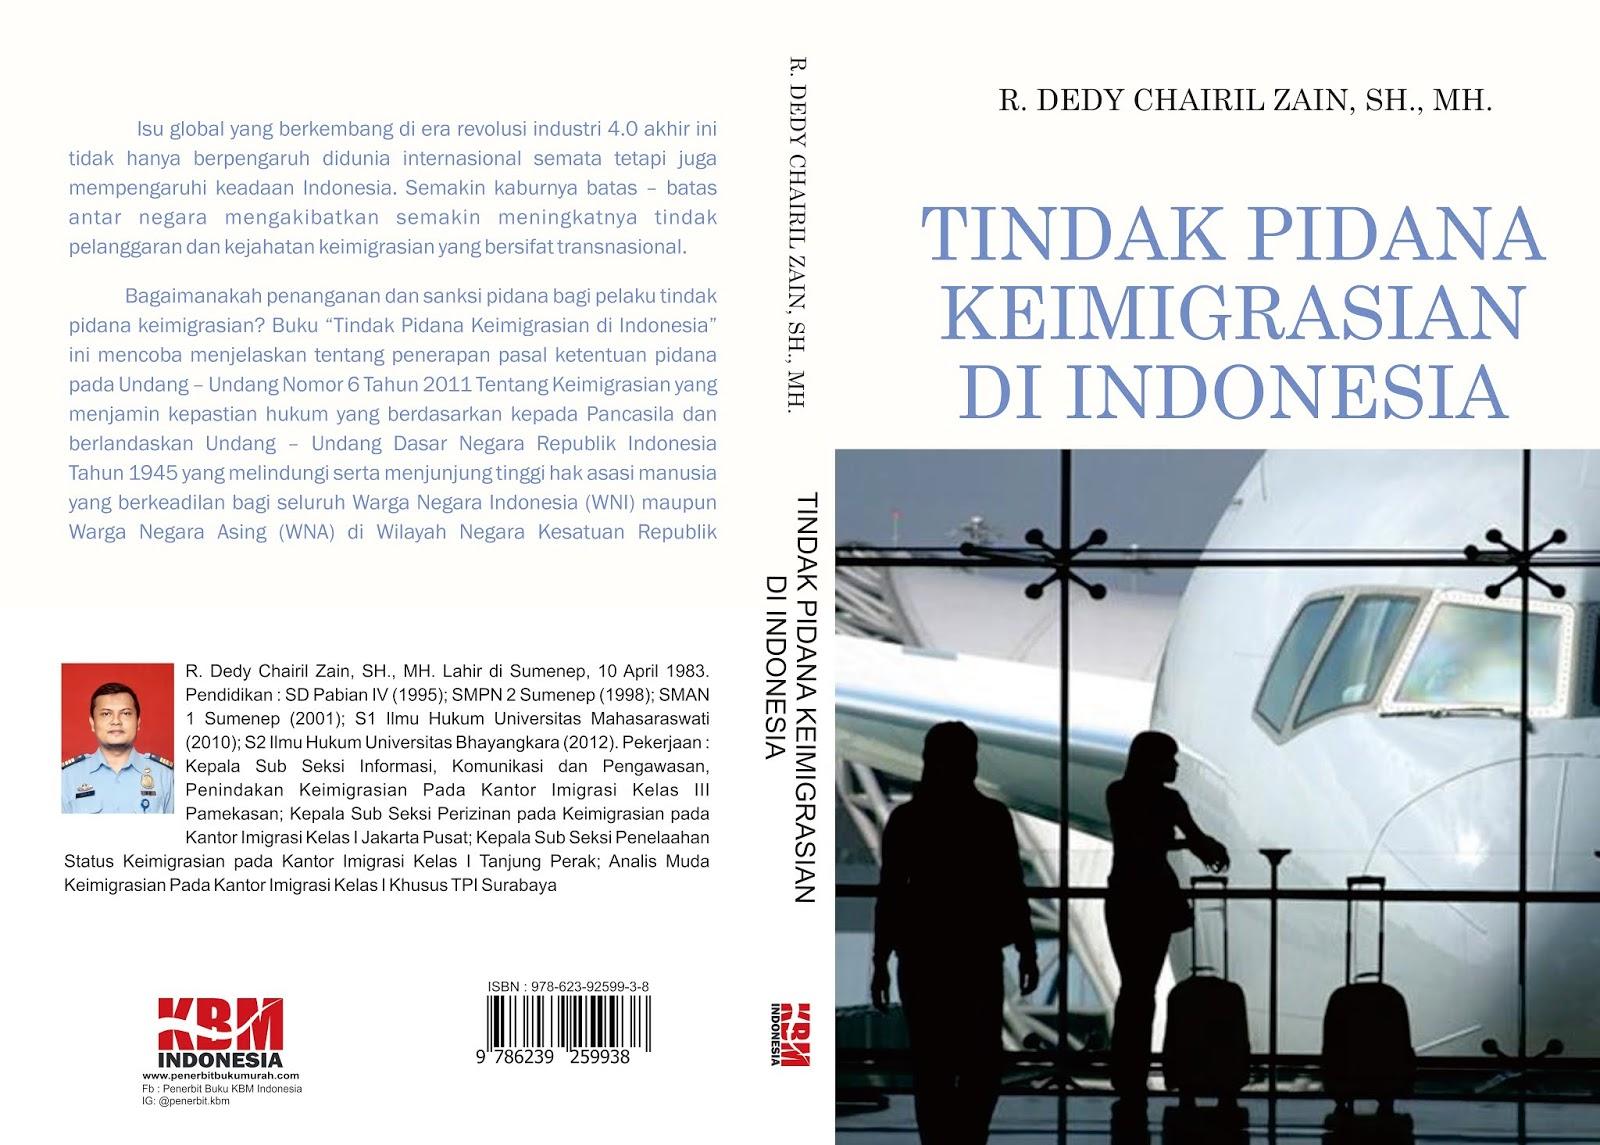 TINDAK PIDANA KEIMIGRASIAN DI INDONESIA